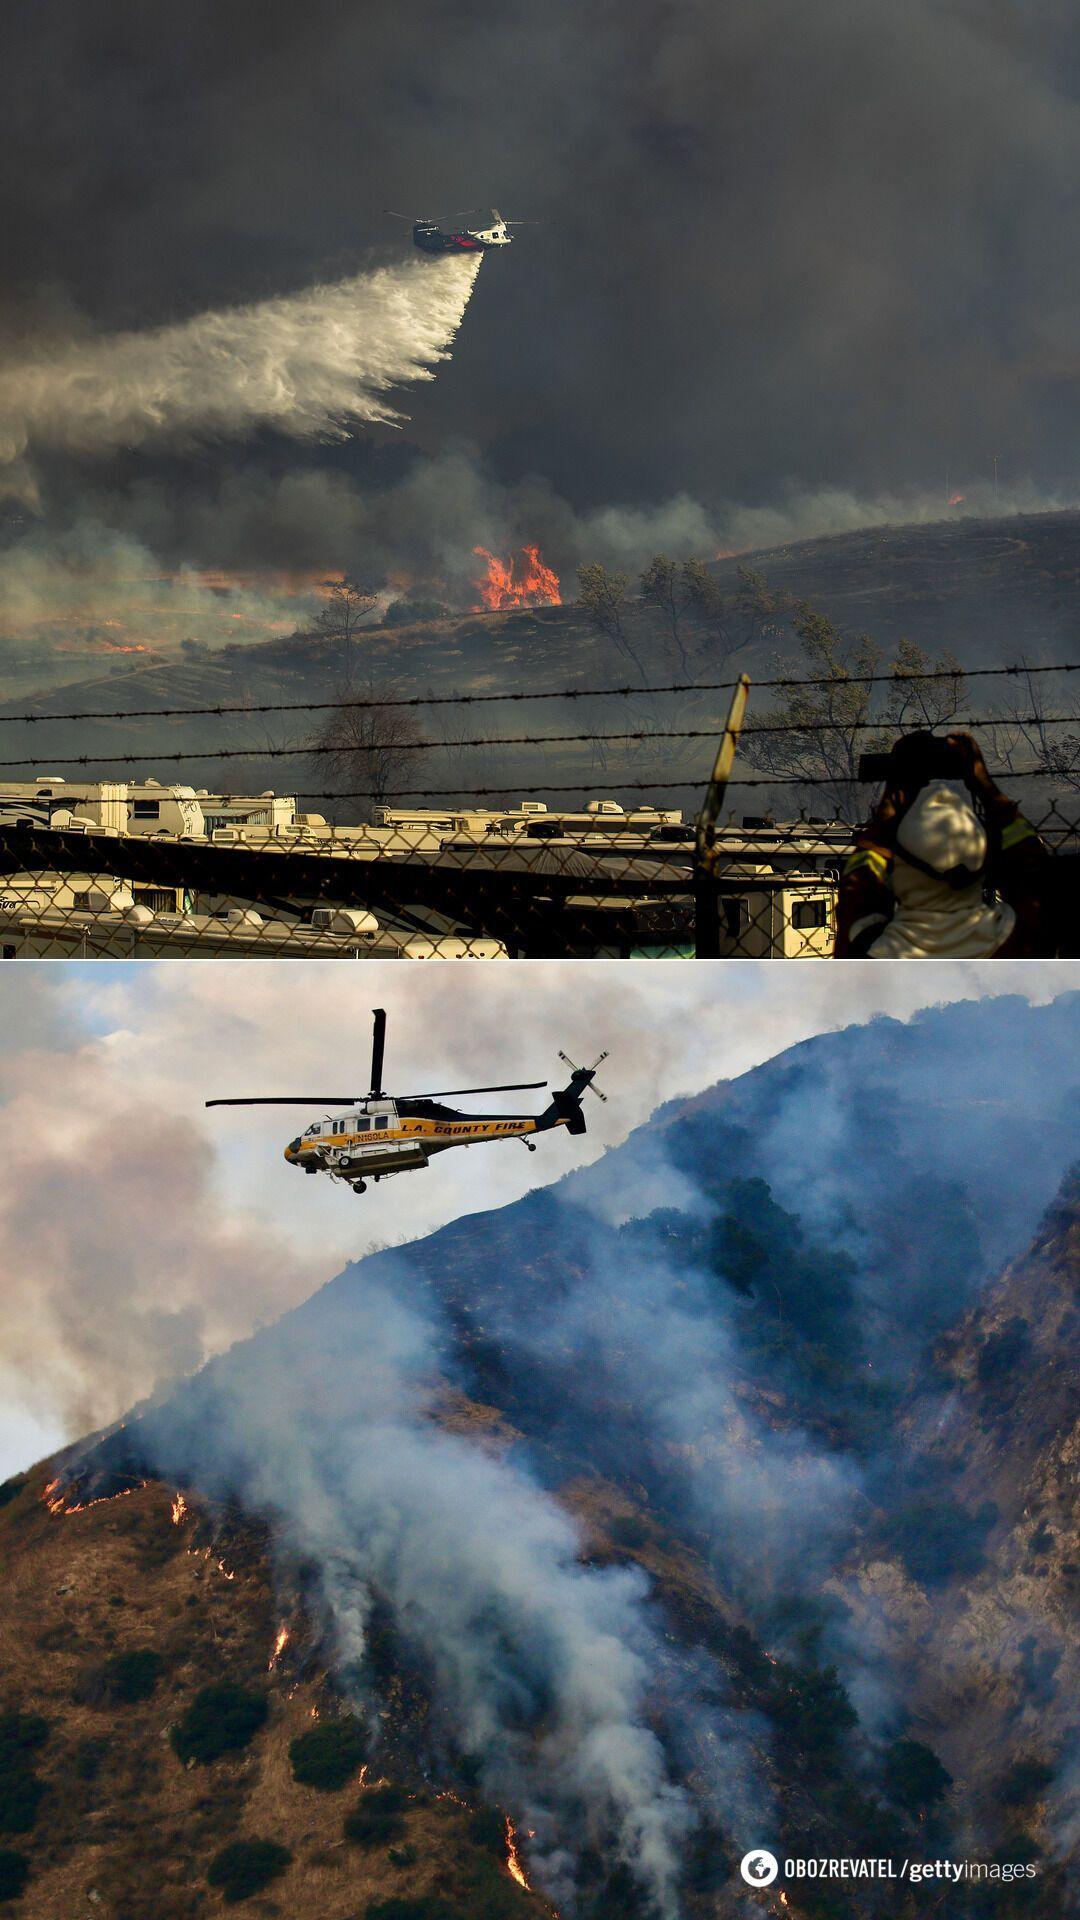 Тушения пожара в районе калифорнийского каньона Сан-Димас, ноябрь 2020-го